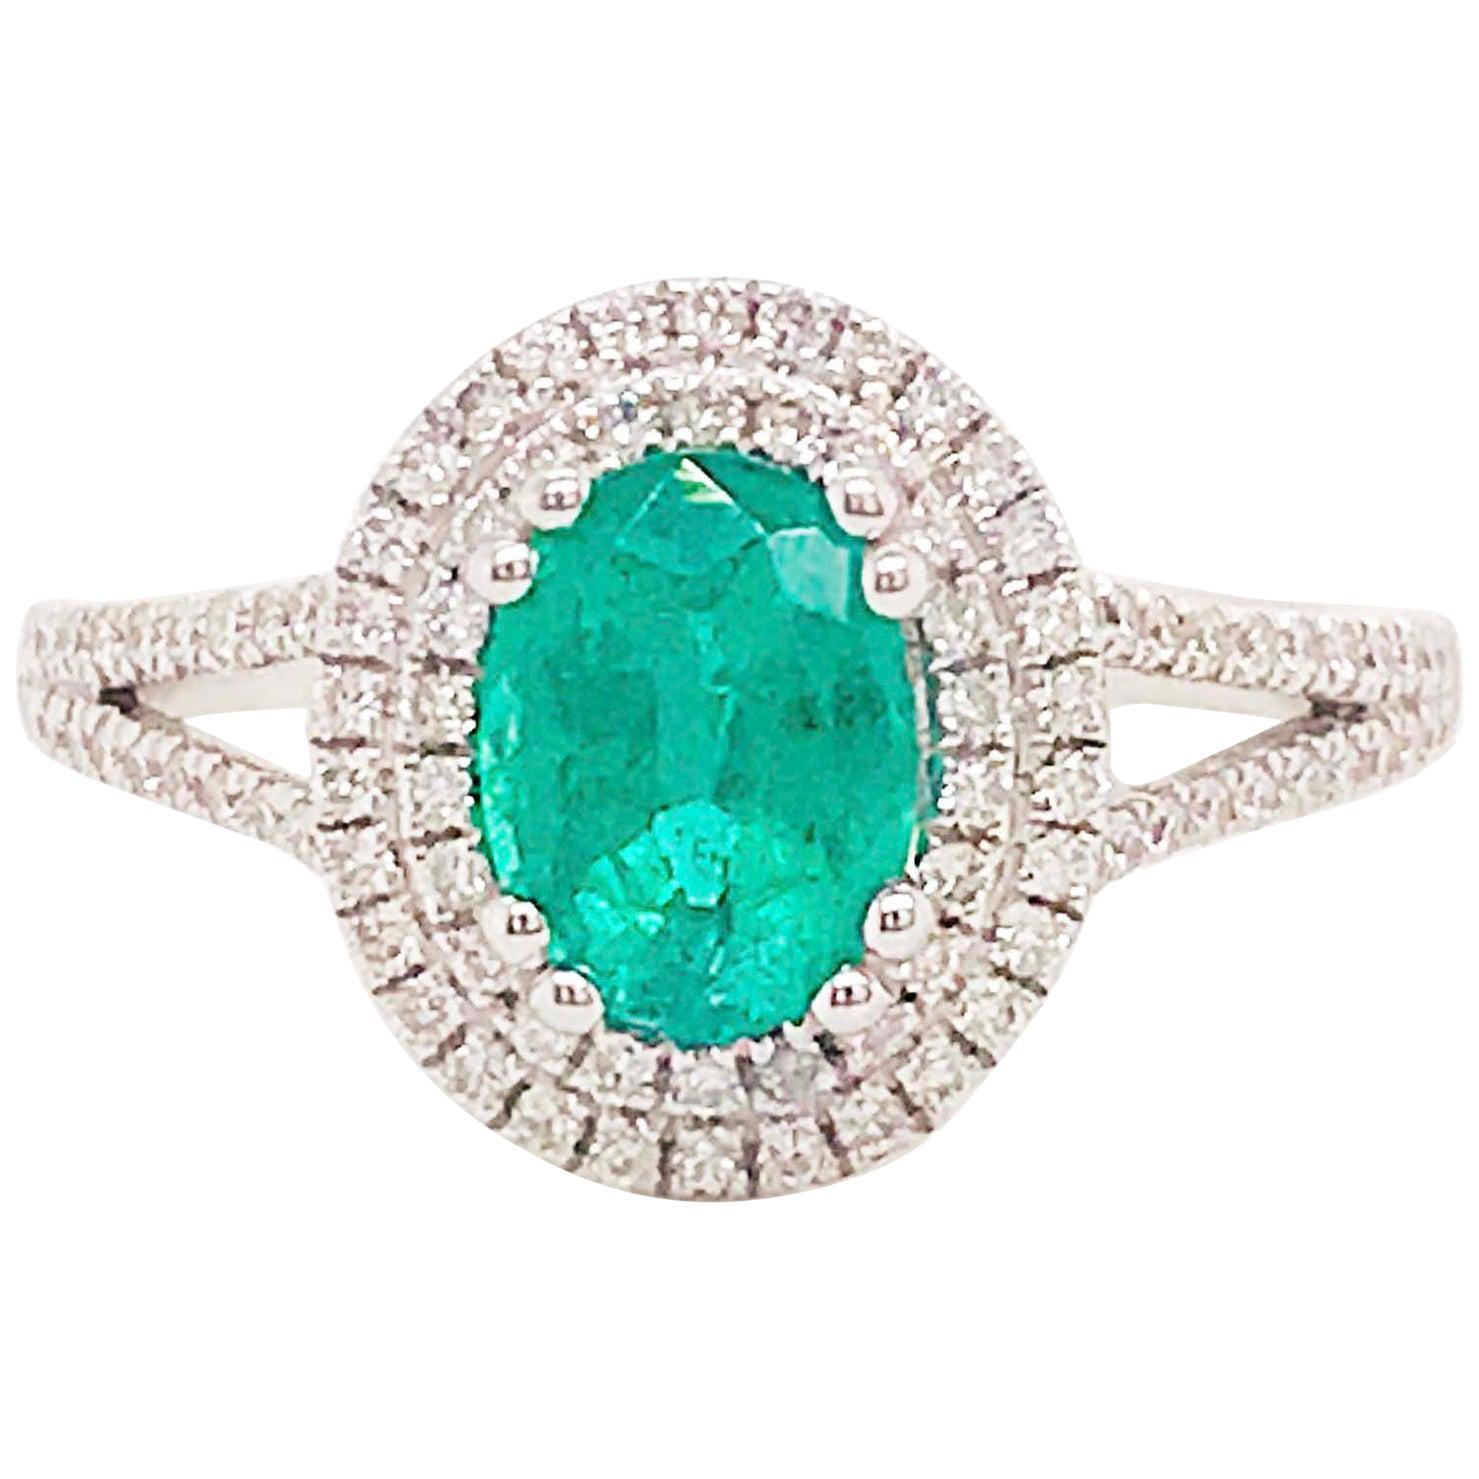 1.50 Carat Oval Emerald and Diamond Halo Engagement Ring White Gold Diamond Band